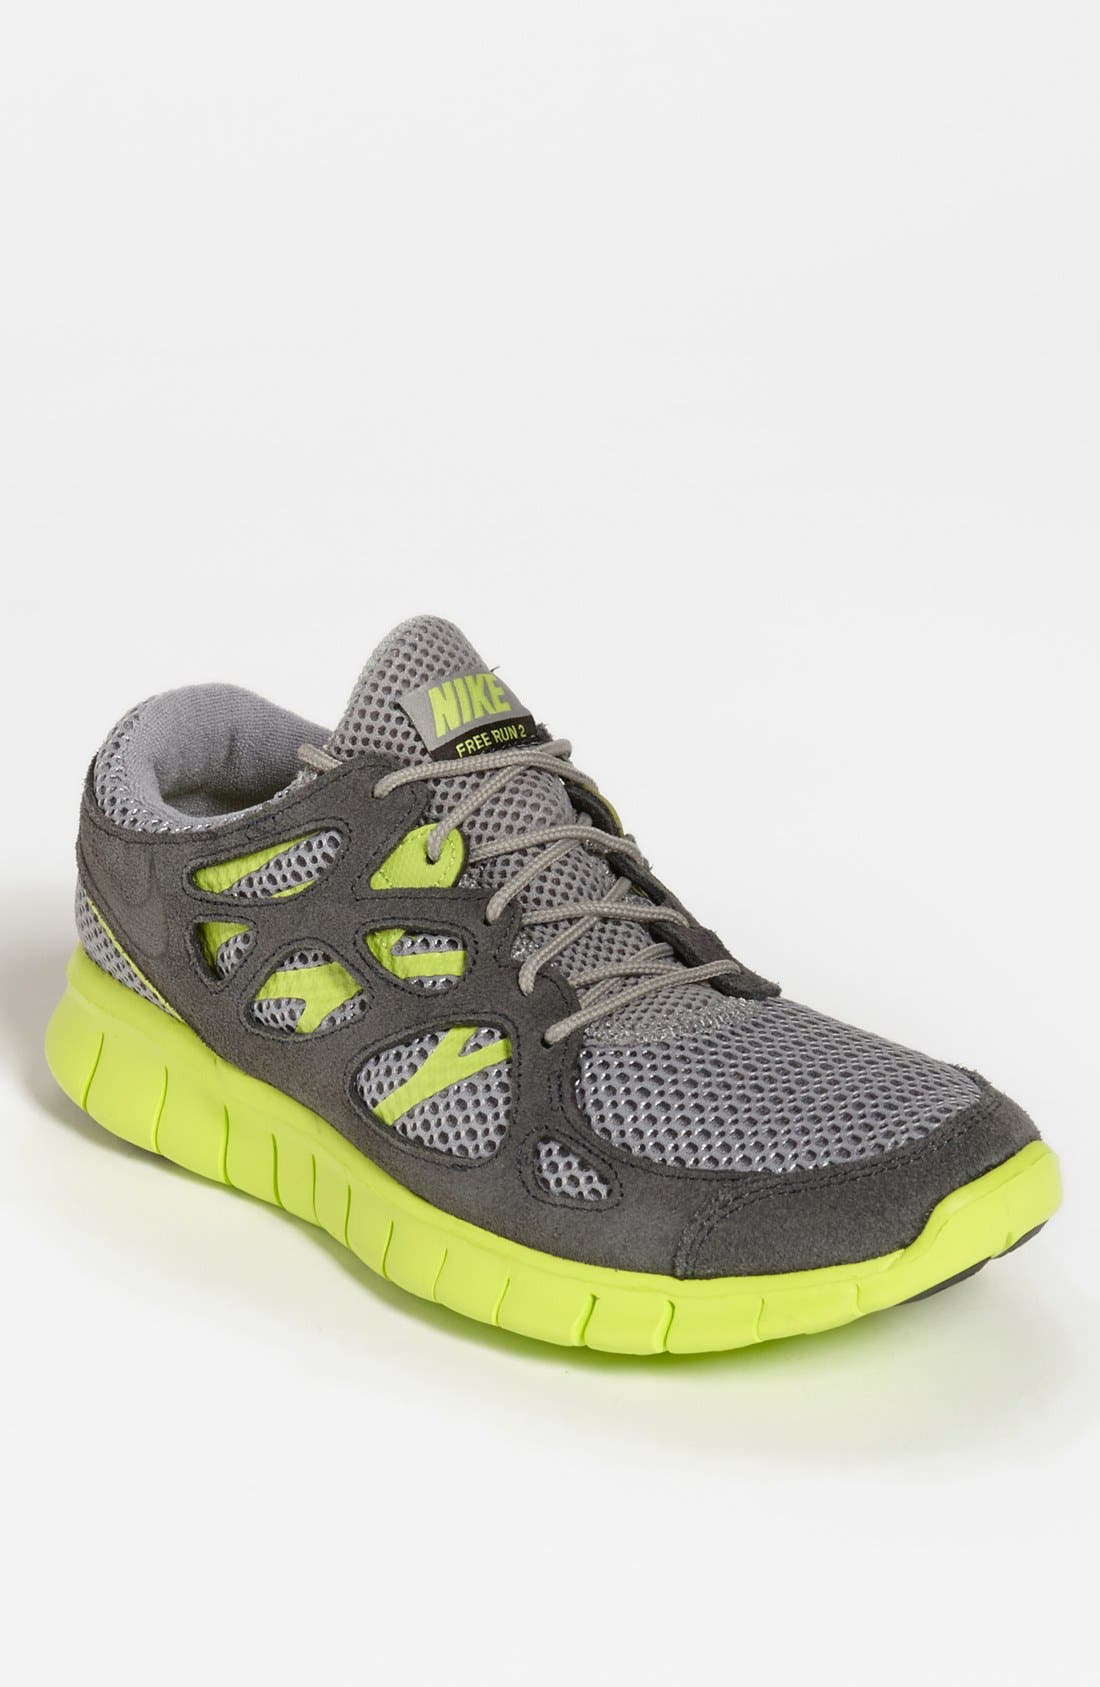 Main Image - Nike 'Free Run+ 2 EXT' Running Shoe (Men)